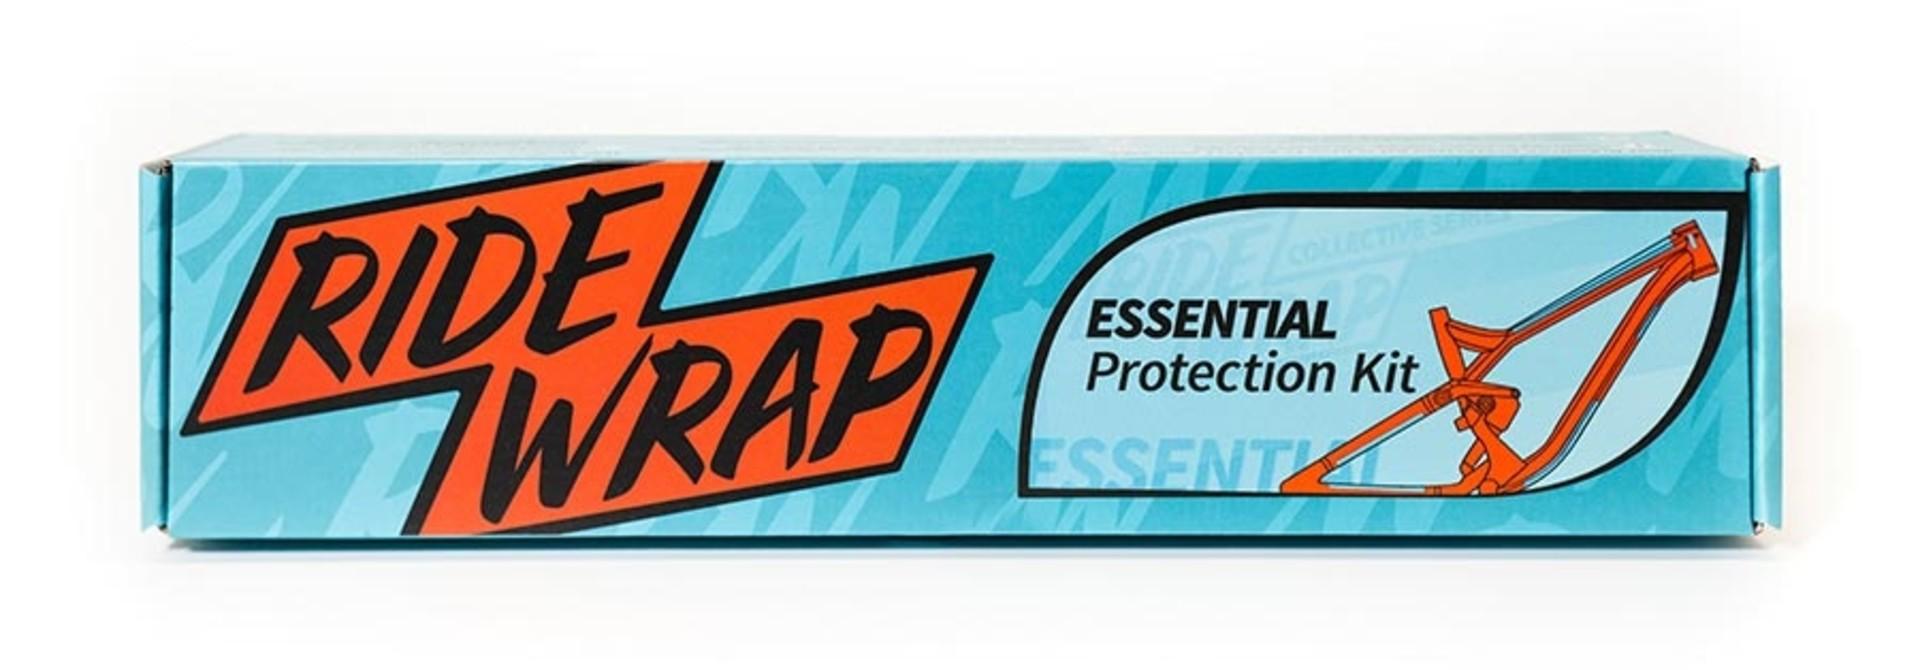 RideWrap Essential Frame Kit - Protective Wrap